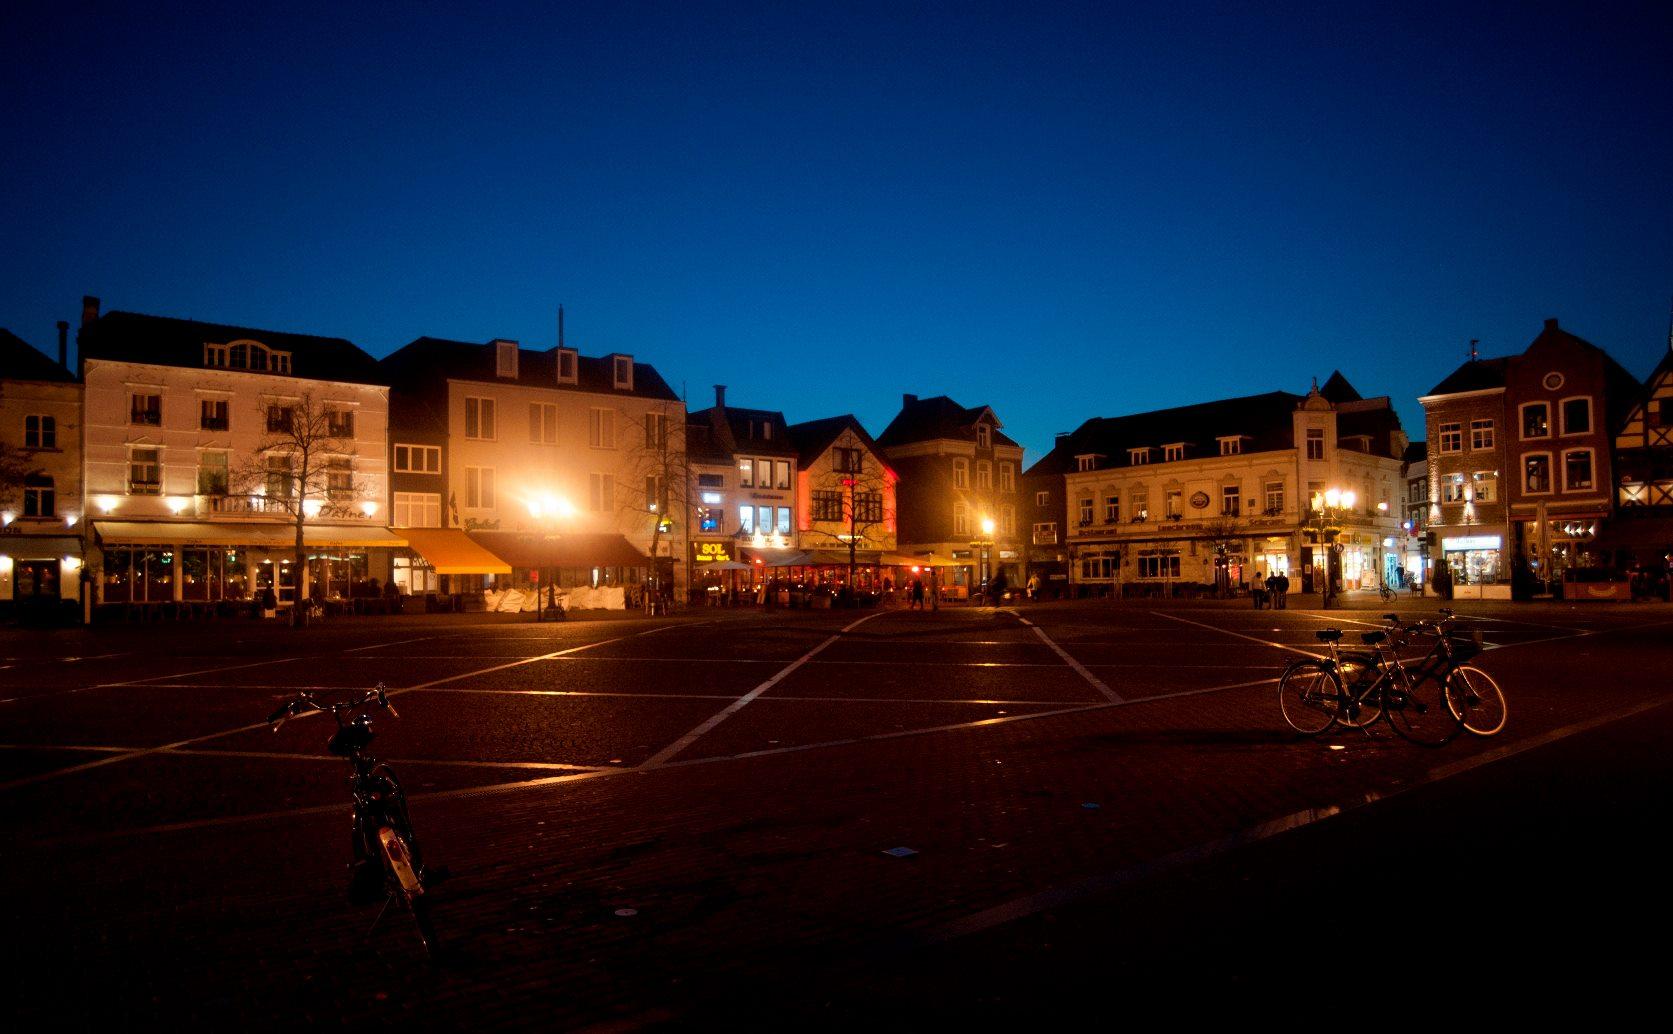 Sittard Market Square